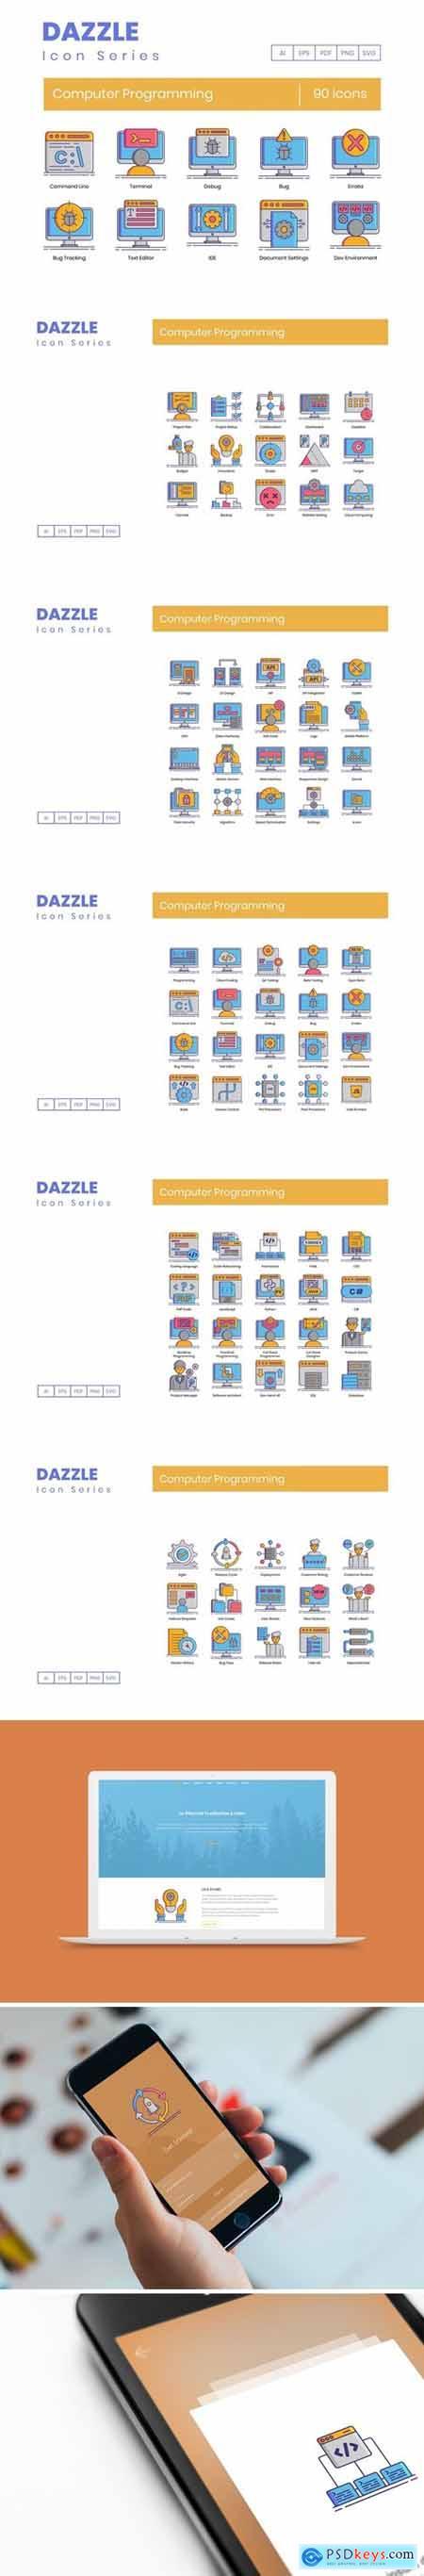 90 Computer Programming Icons - Dazzle Series